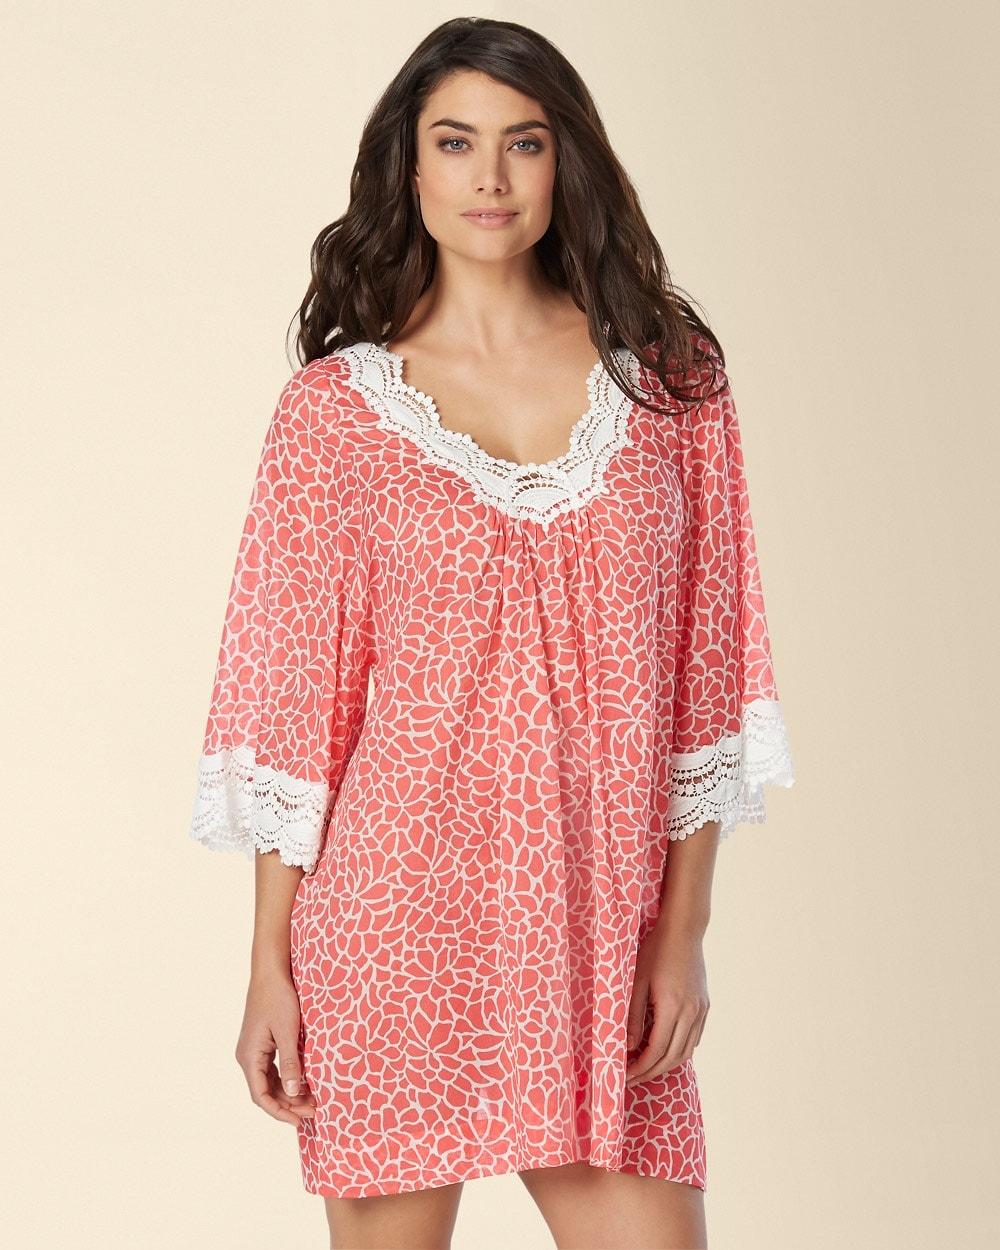 Mosaic Petals Short Cotton Nightgown Apricot Print - Soma